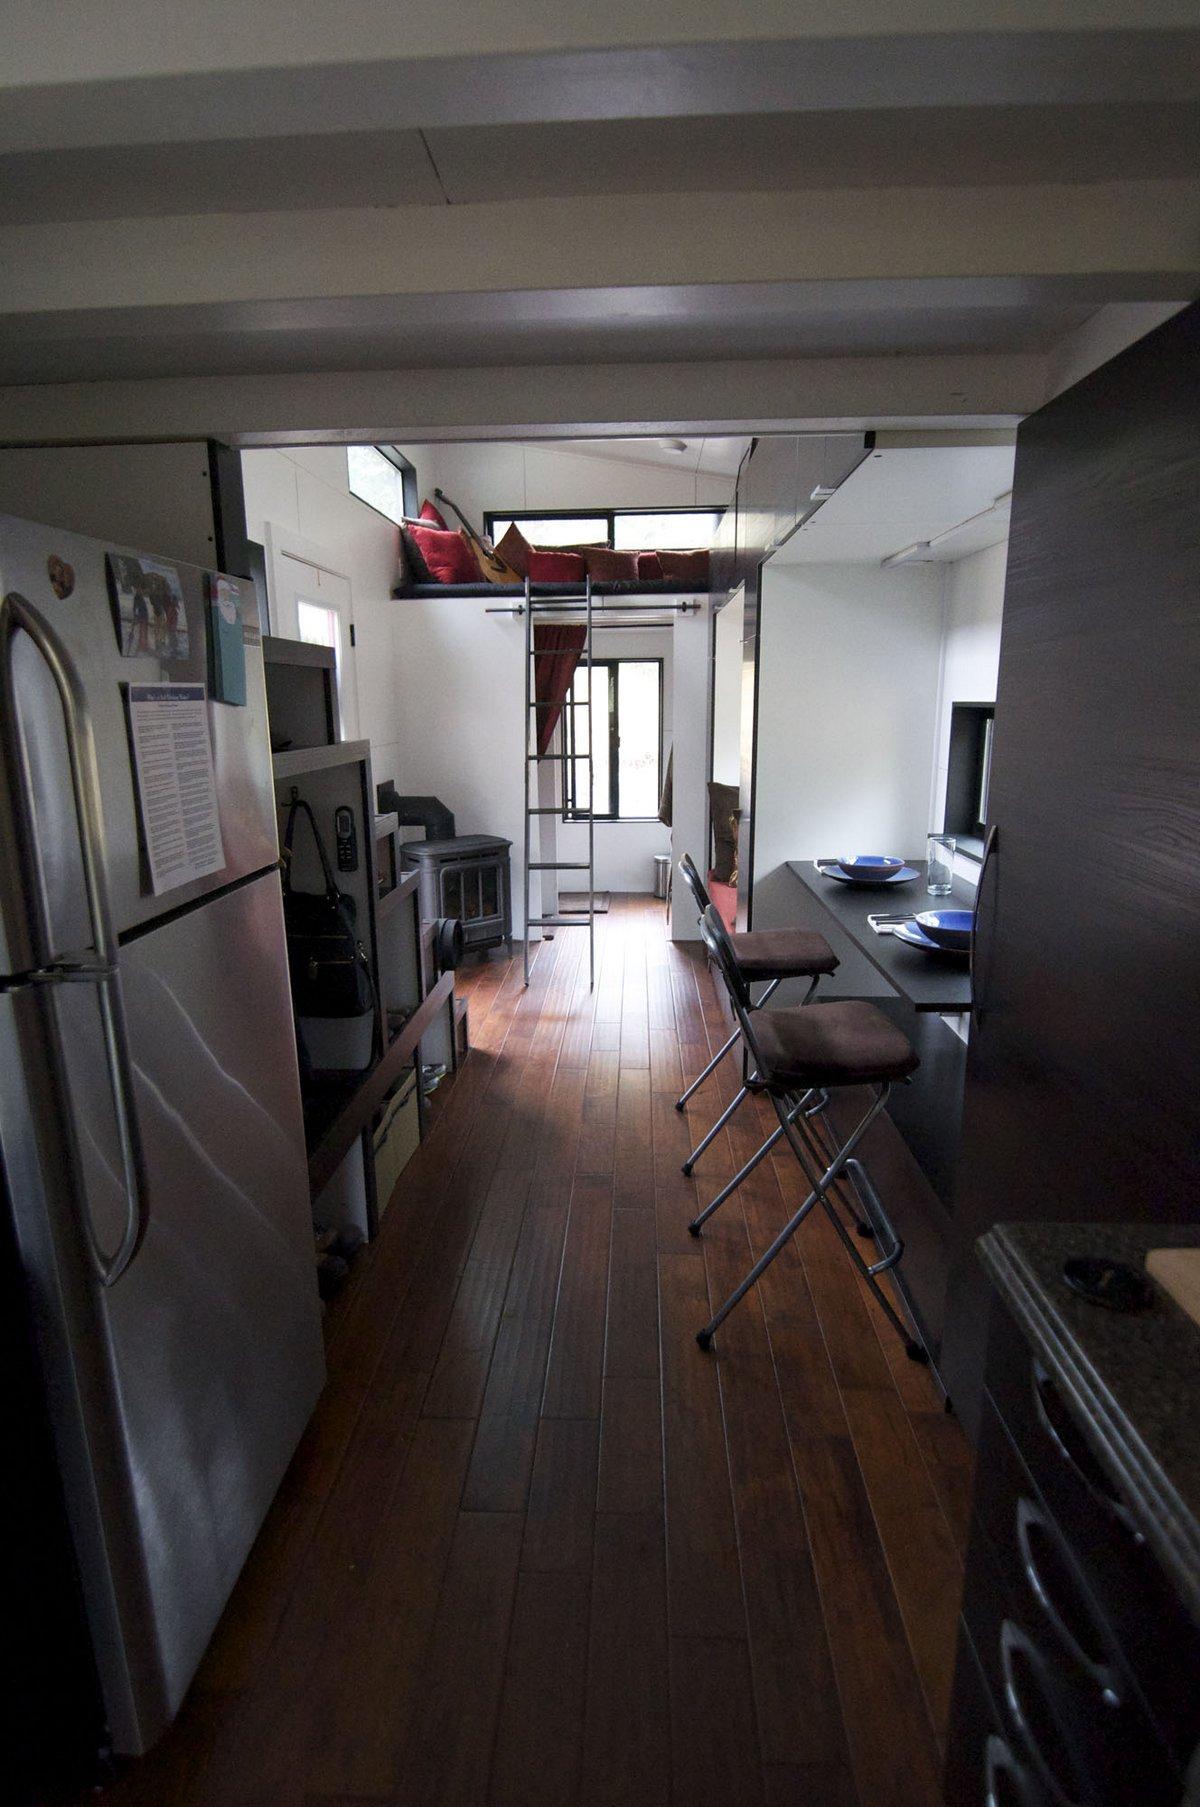 hOMe, Andrew Morrison, Gabriella Morrison, дом на колесах, Tiny House Build, крошечный дом, видео обзор дом на колесах, жилой трейлер